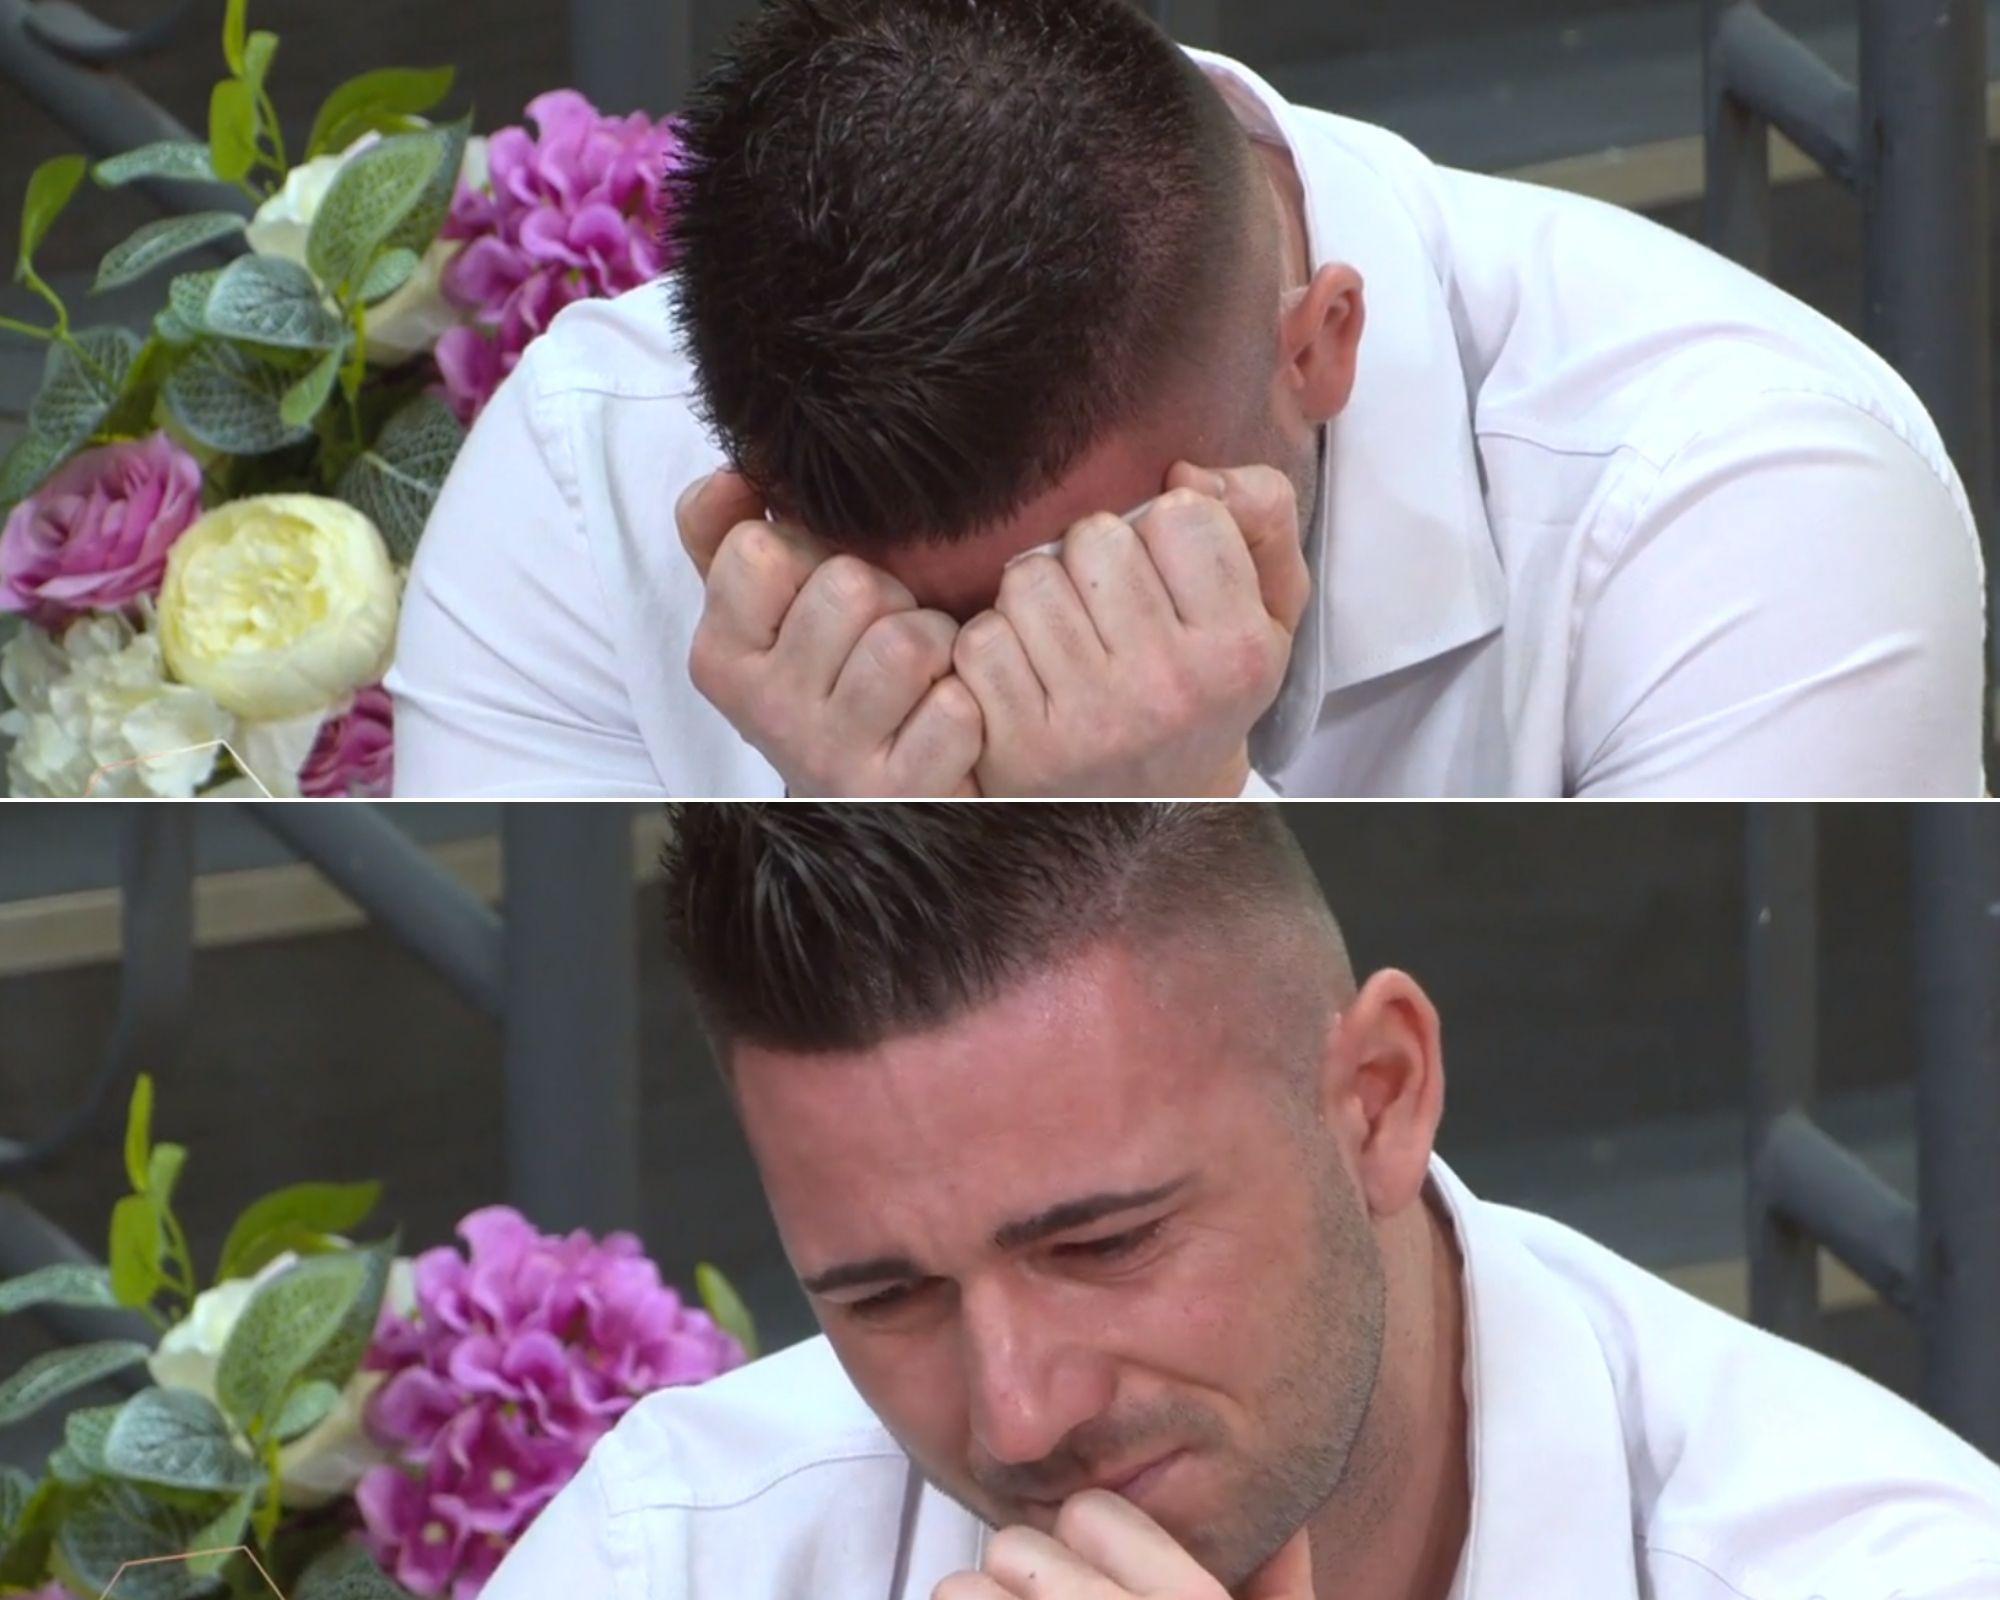 Stefan de la Mireasa in timp ce plange pentru ca bunica sa este grav bolnava